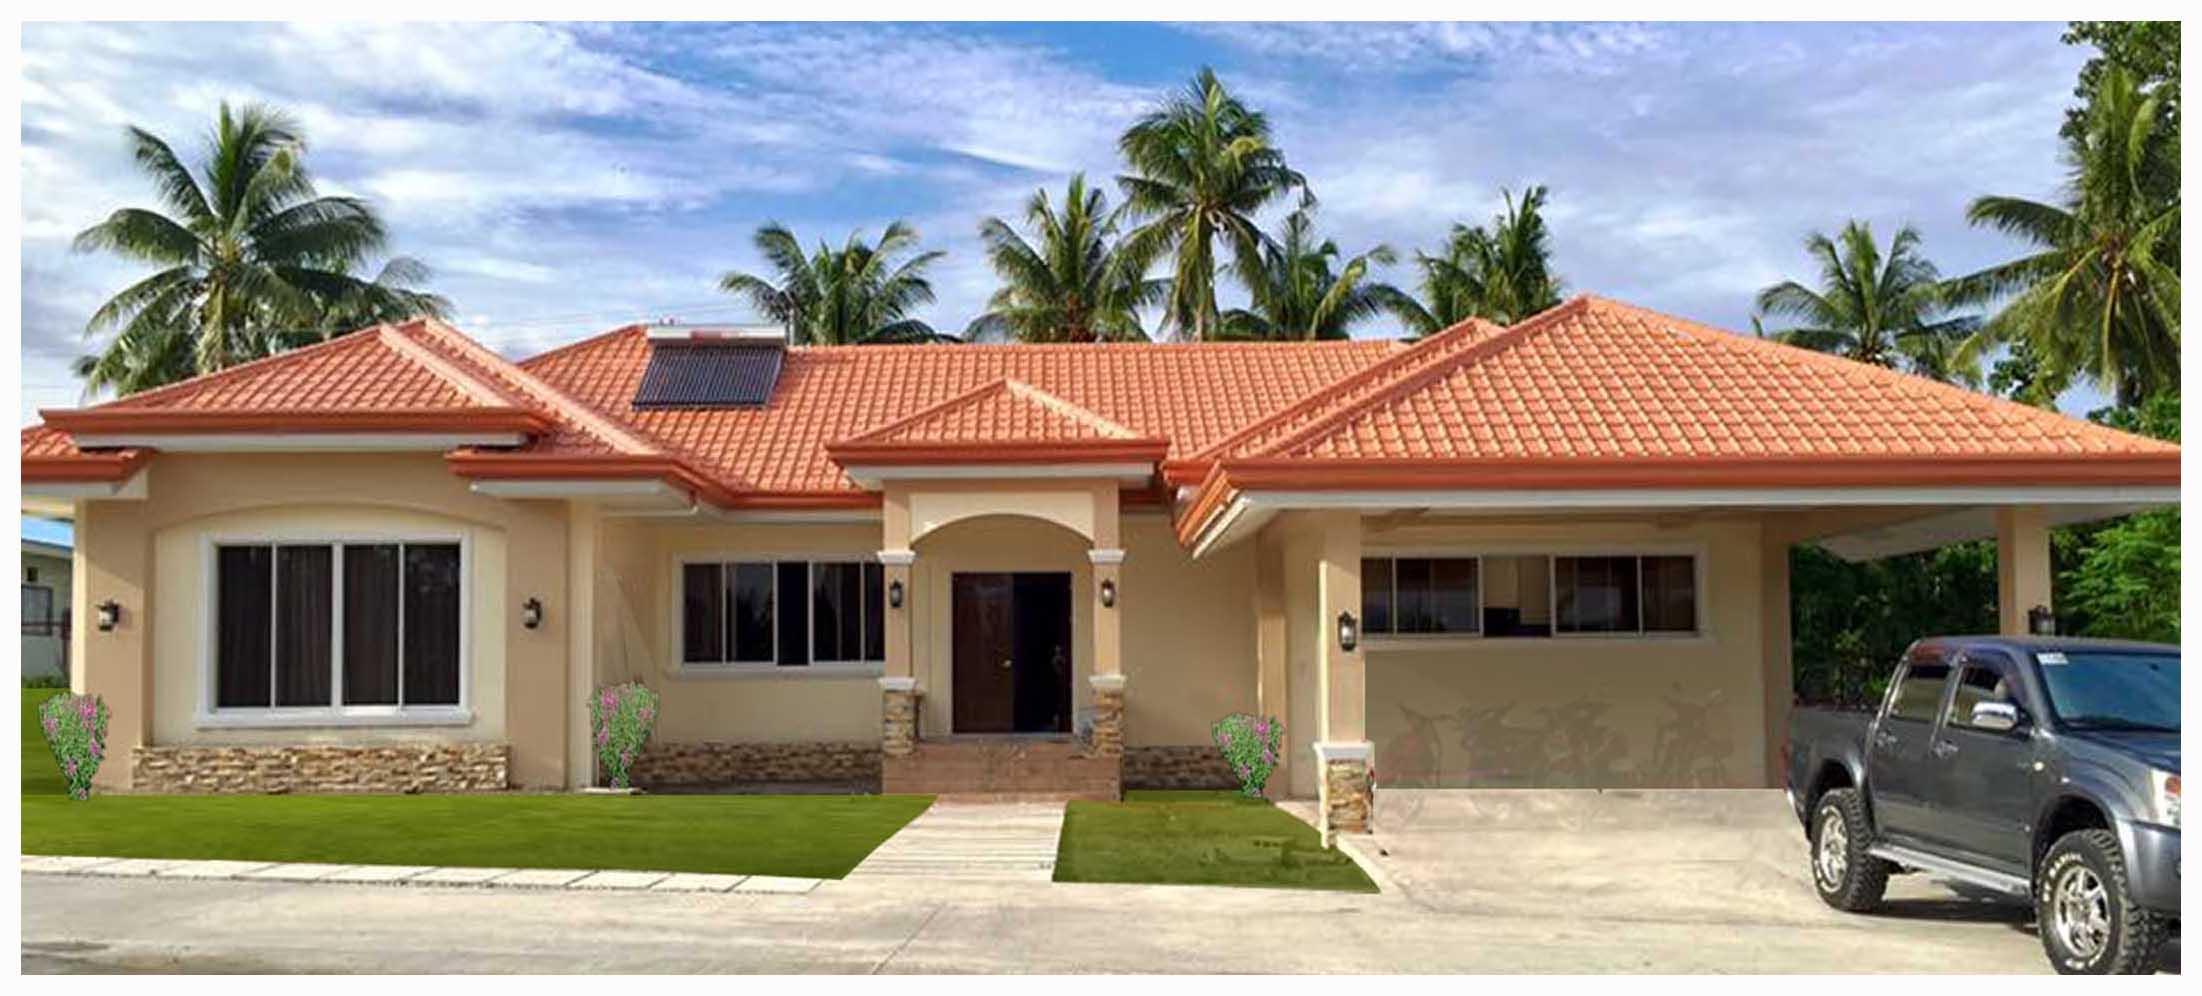 Beautiful Detailed Description: New Luxury Ocean View House For Sale U003cu003eu003cu003e Beautiful  New Construction Home With Beach Access. U003cu003eu003cu003e Price Php 9.26 Million.